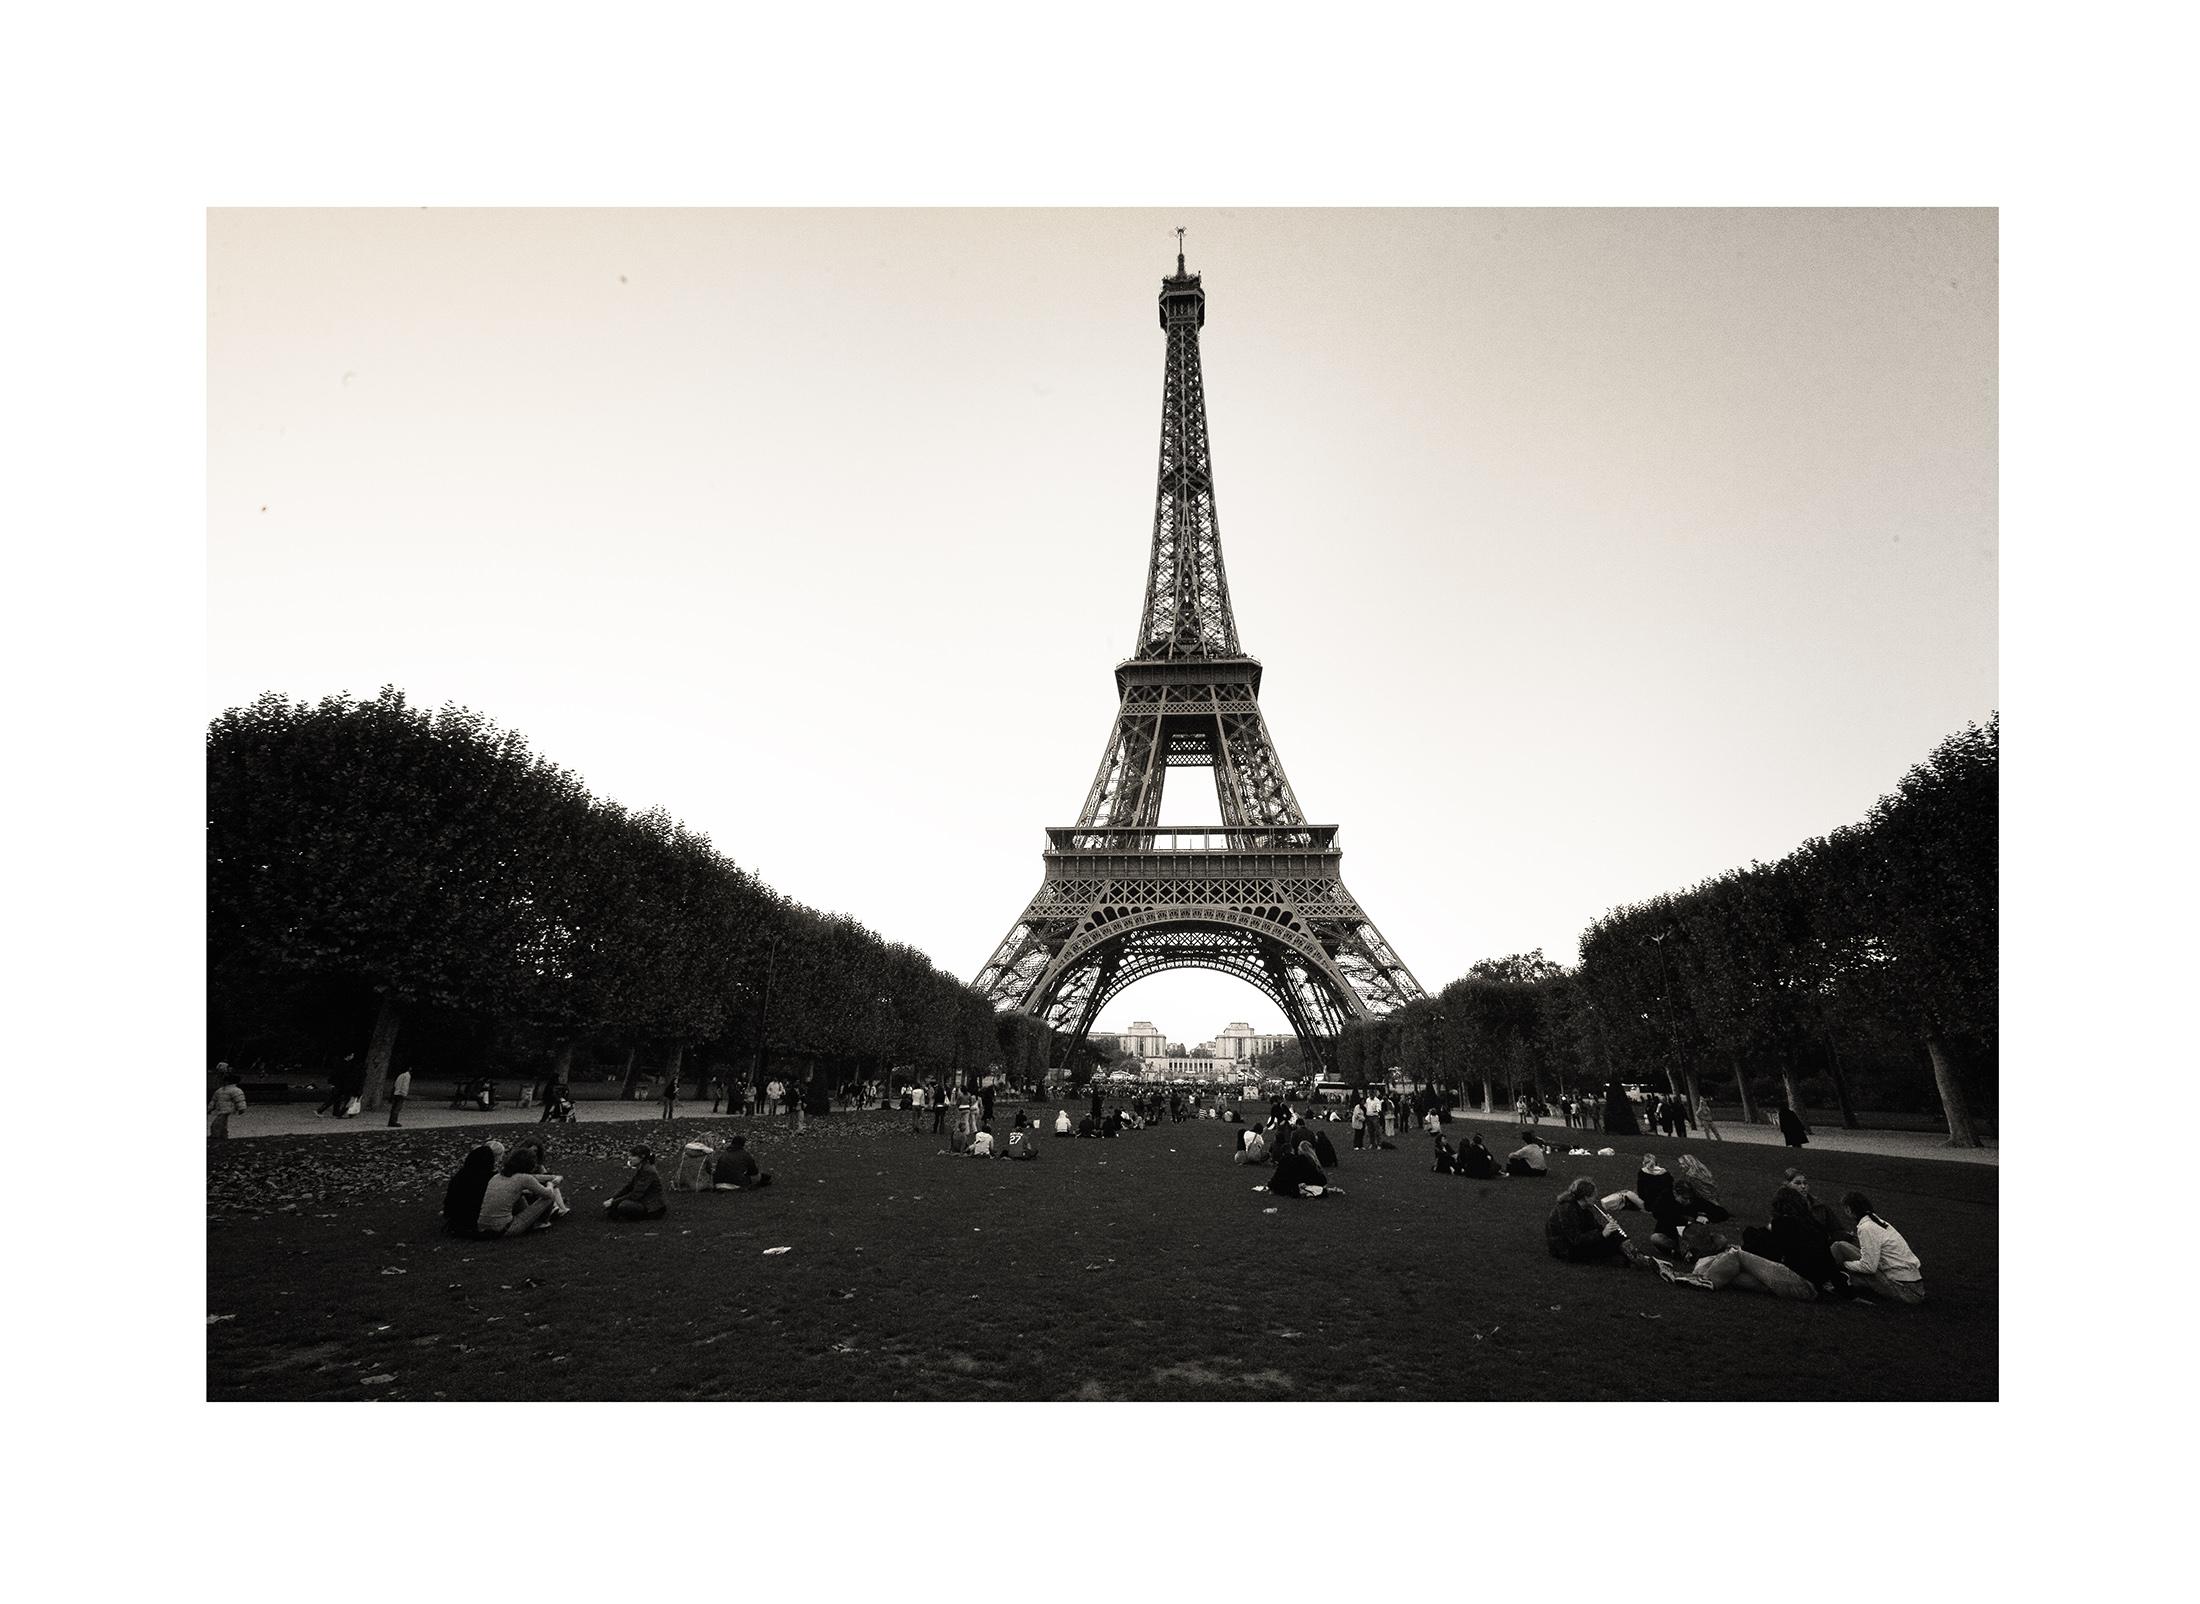 Paris_MG_9973.jpg